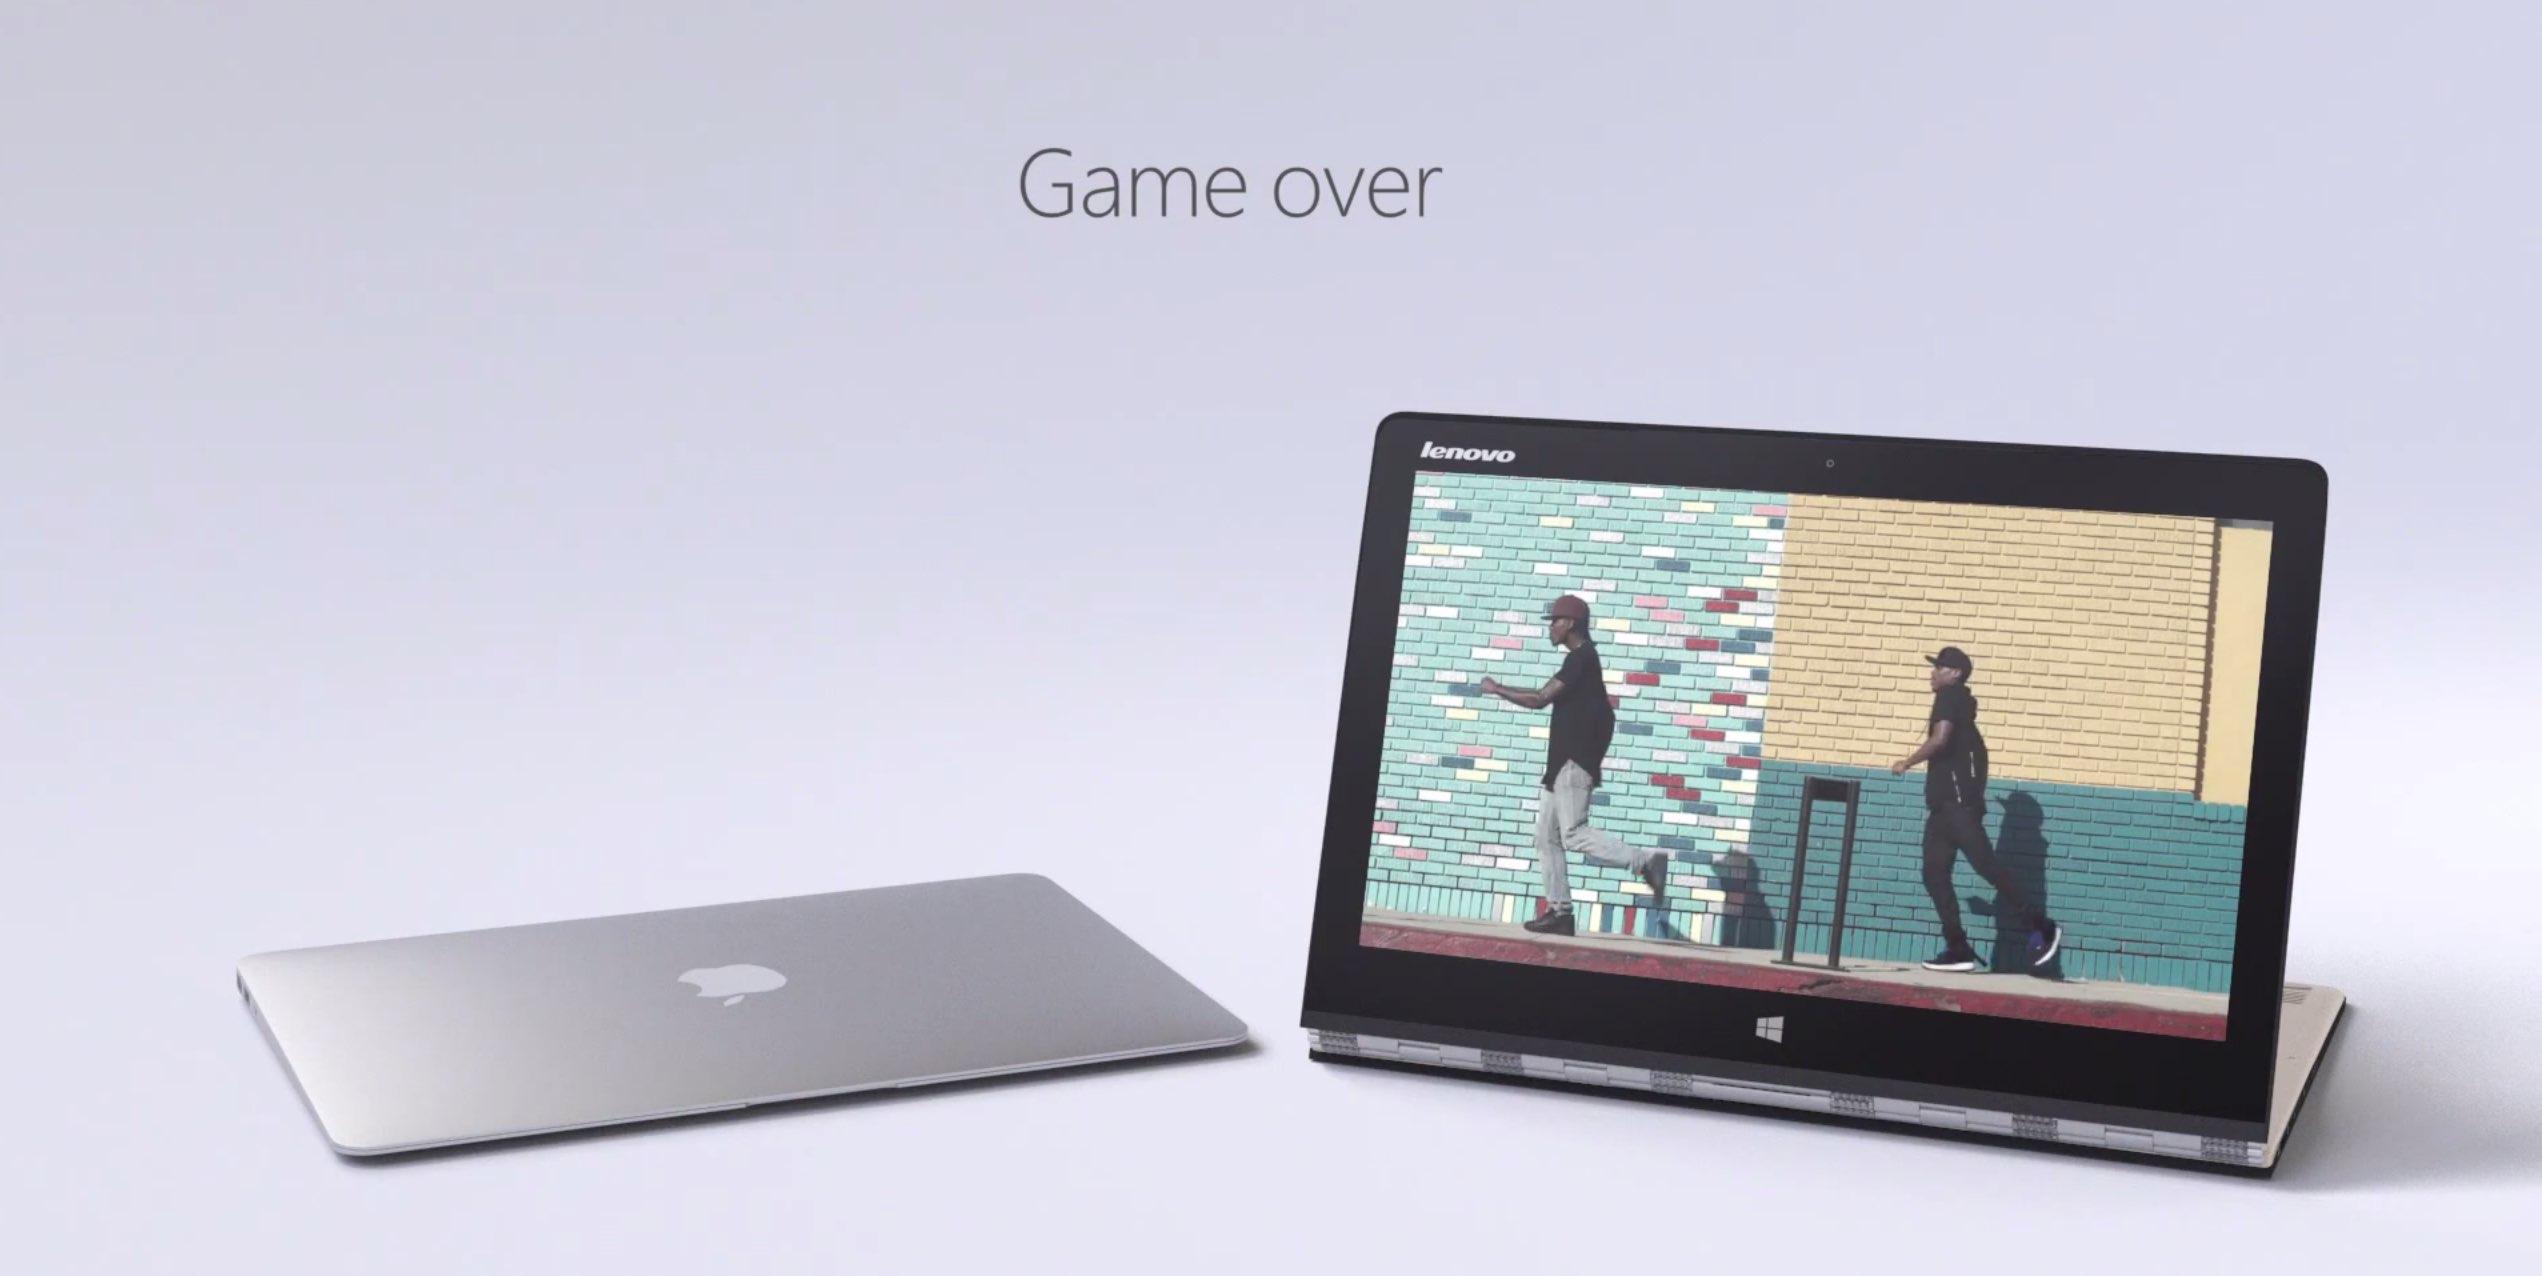 Microsoft: Game Over fürs MacBook Air? 5